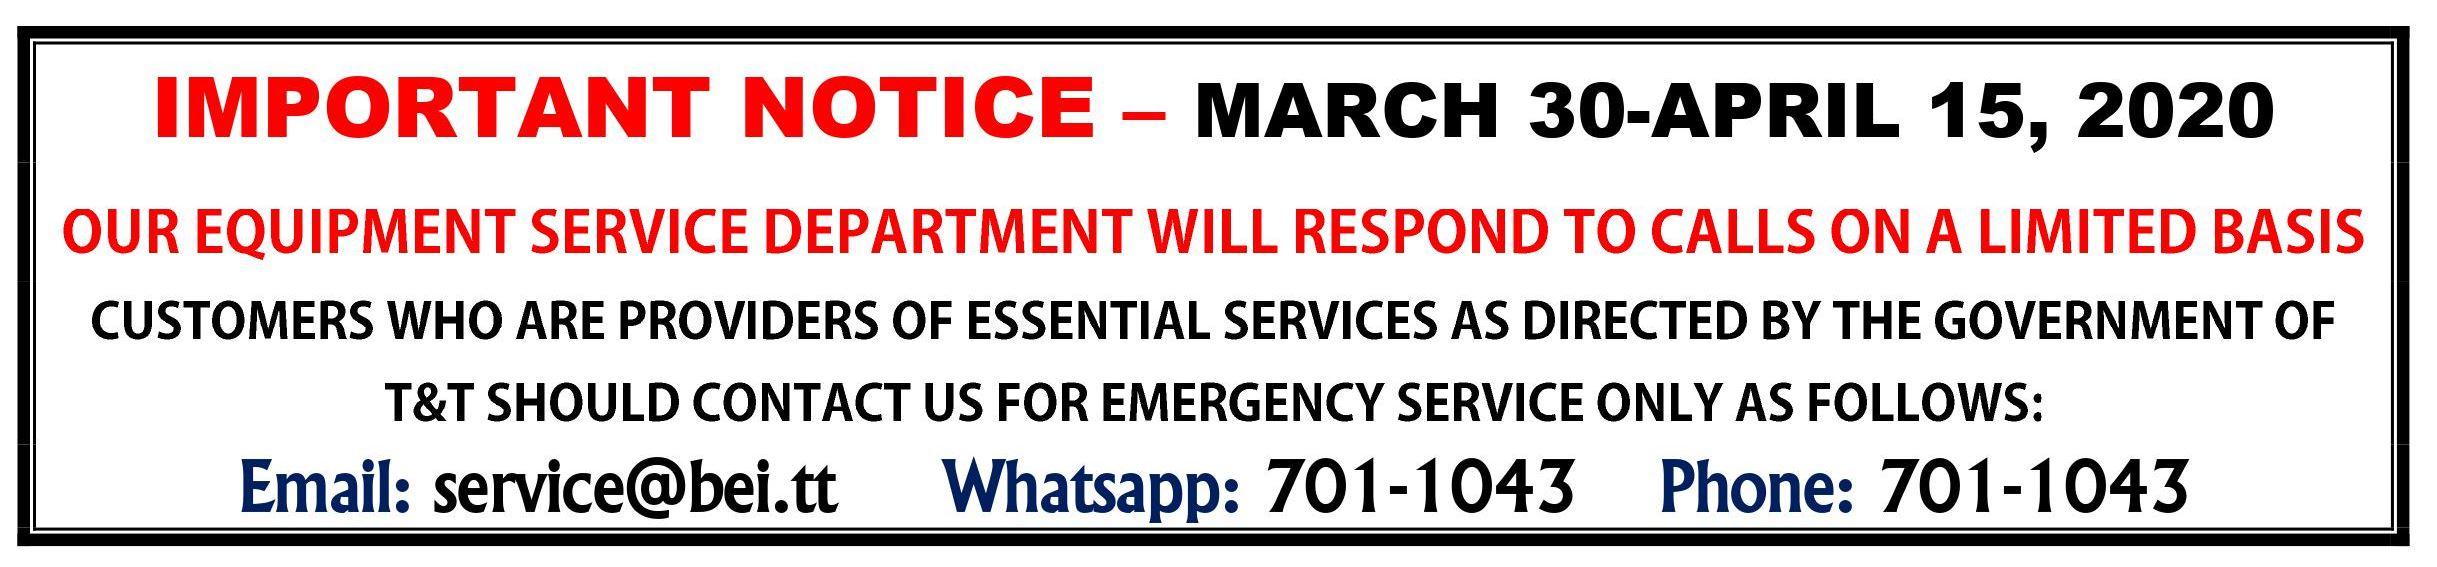 Limited Service: Mar 30-Apr 15, 2020